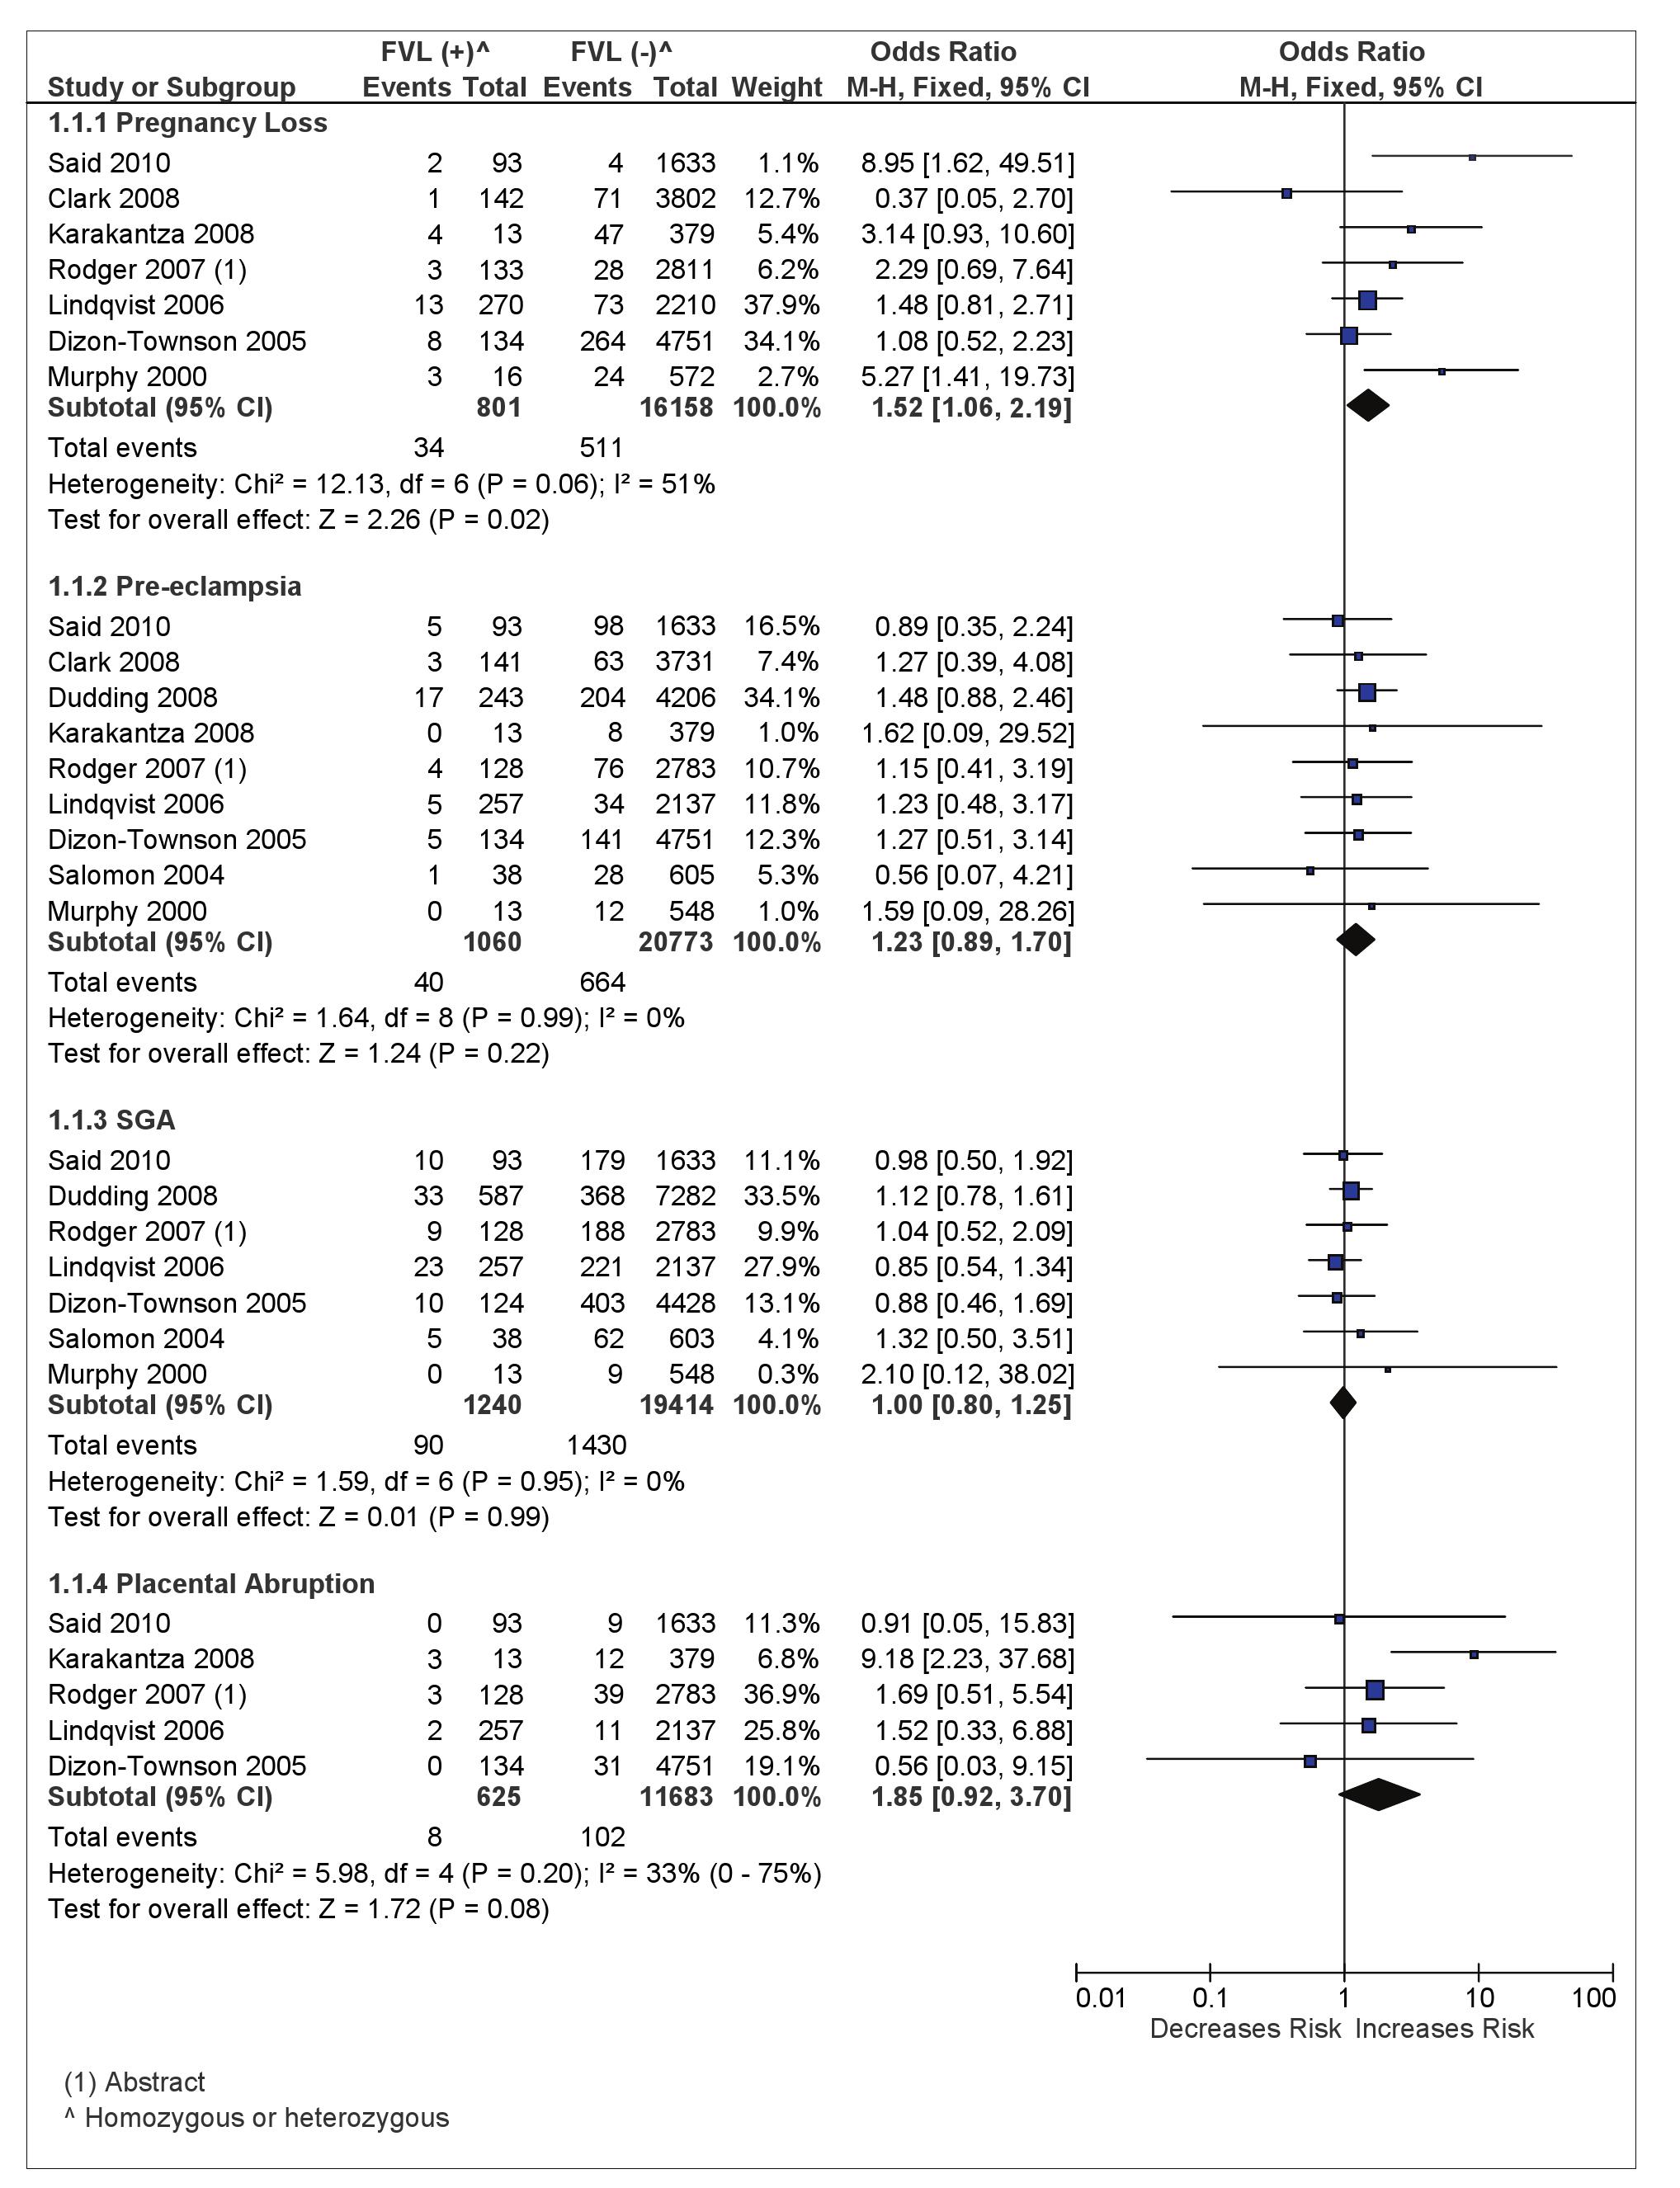 Odds of placenta-mediated pregnancy complications in FVL (homozygous or heterozygous)-positive women.